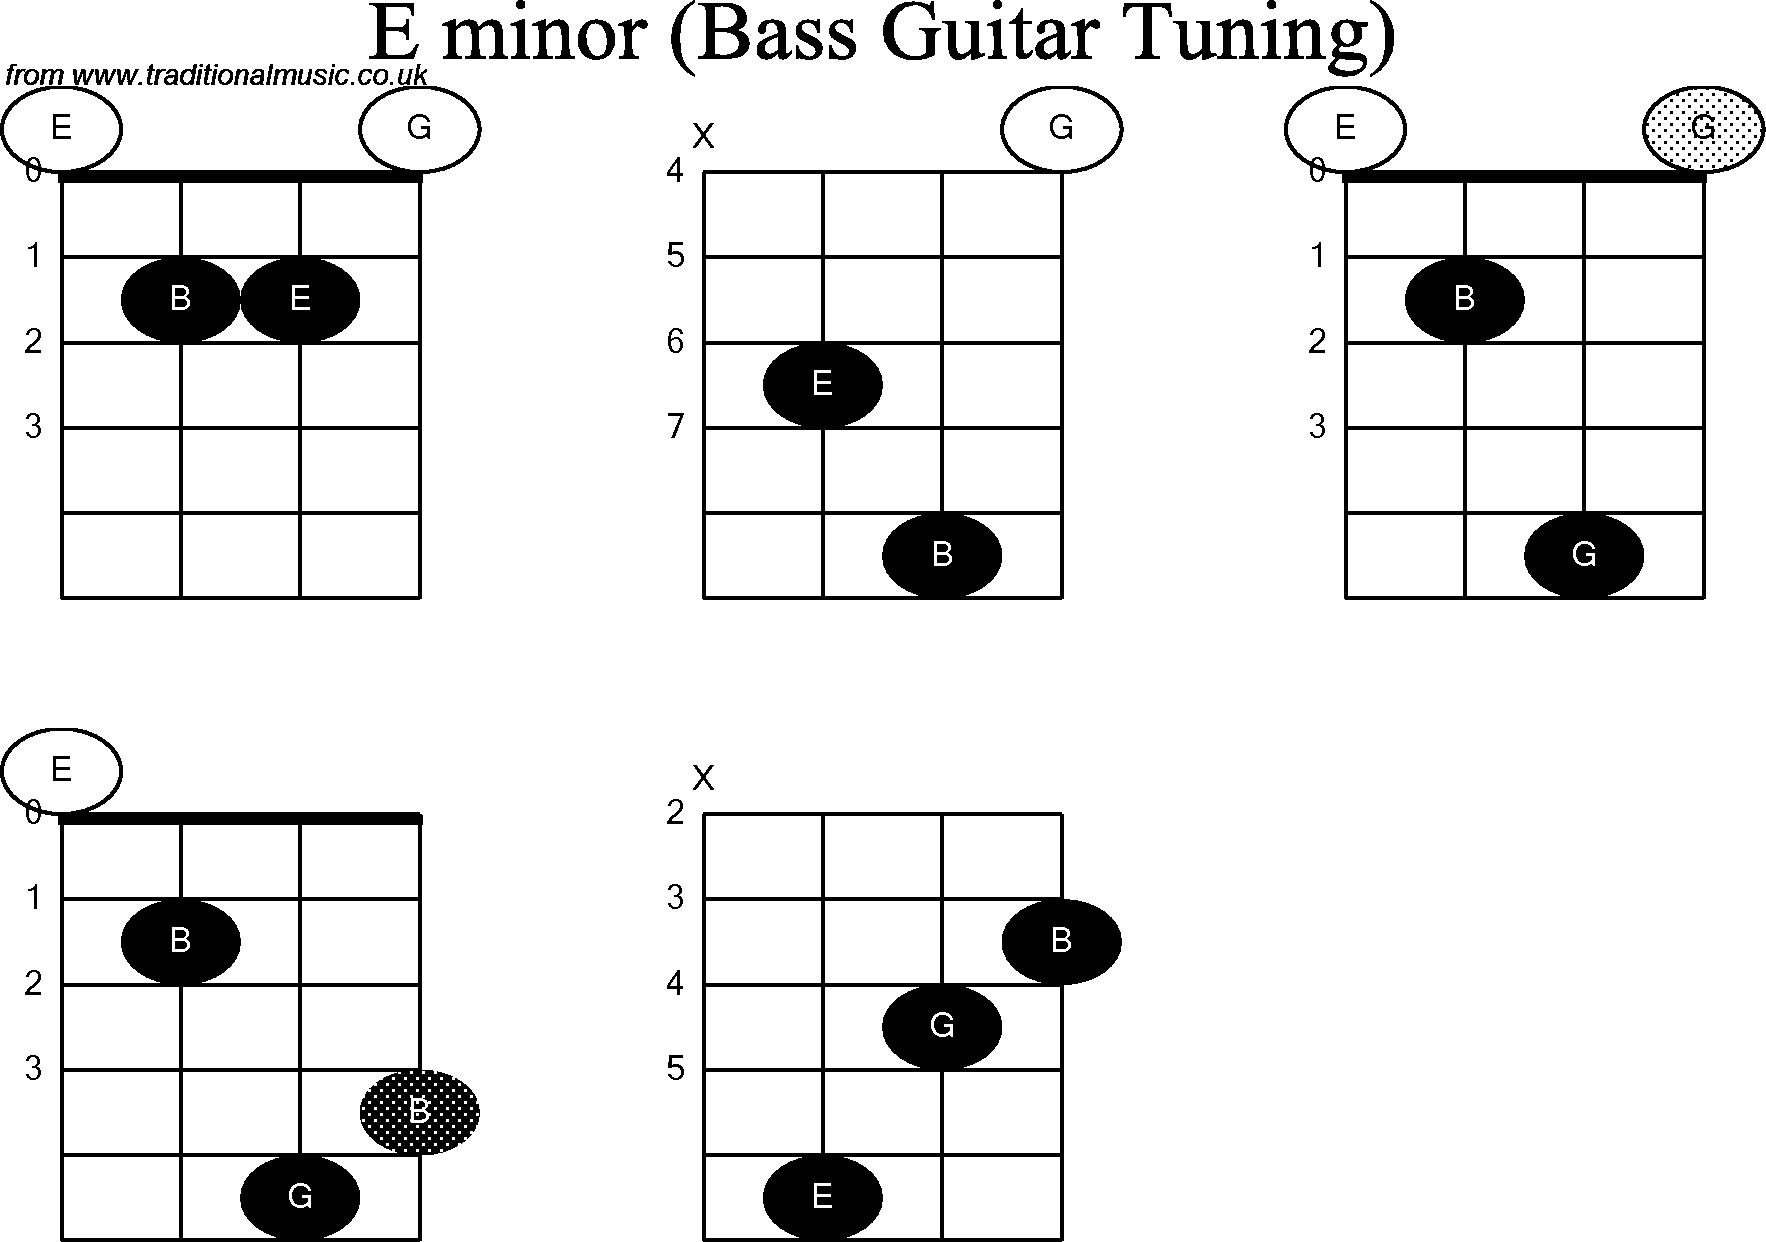 Bass Guitar Chords Bass Guitar Chord Diagrams For E Minor